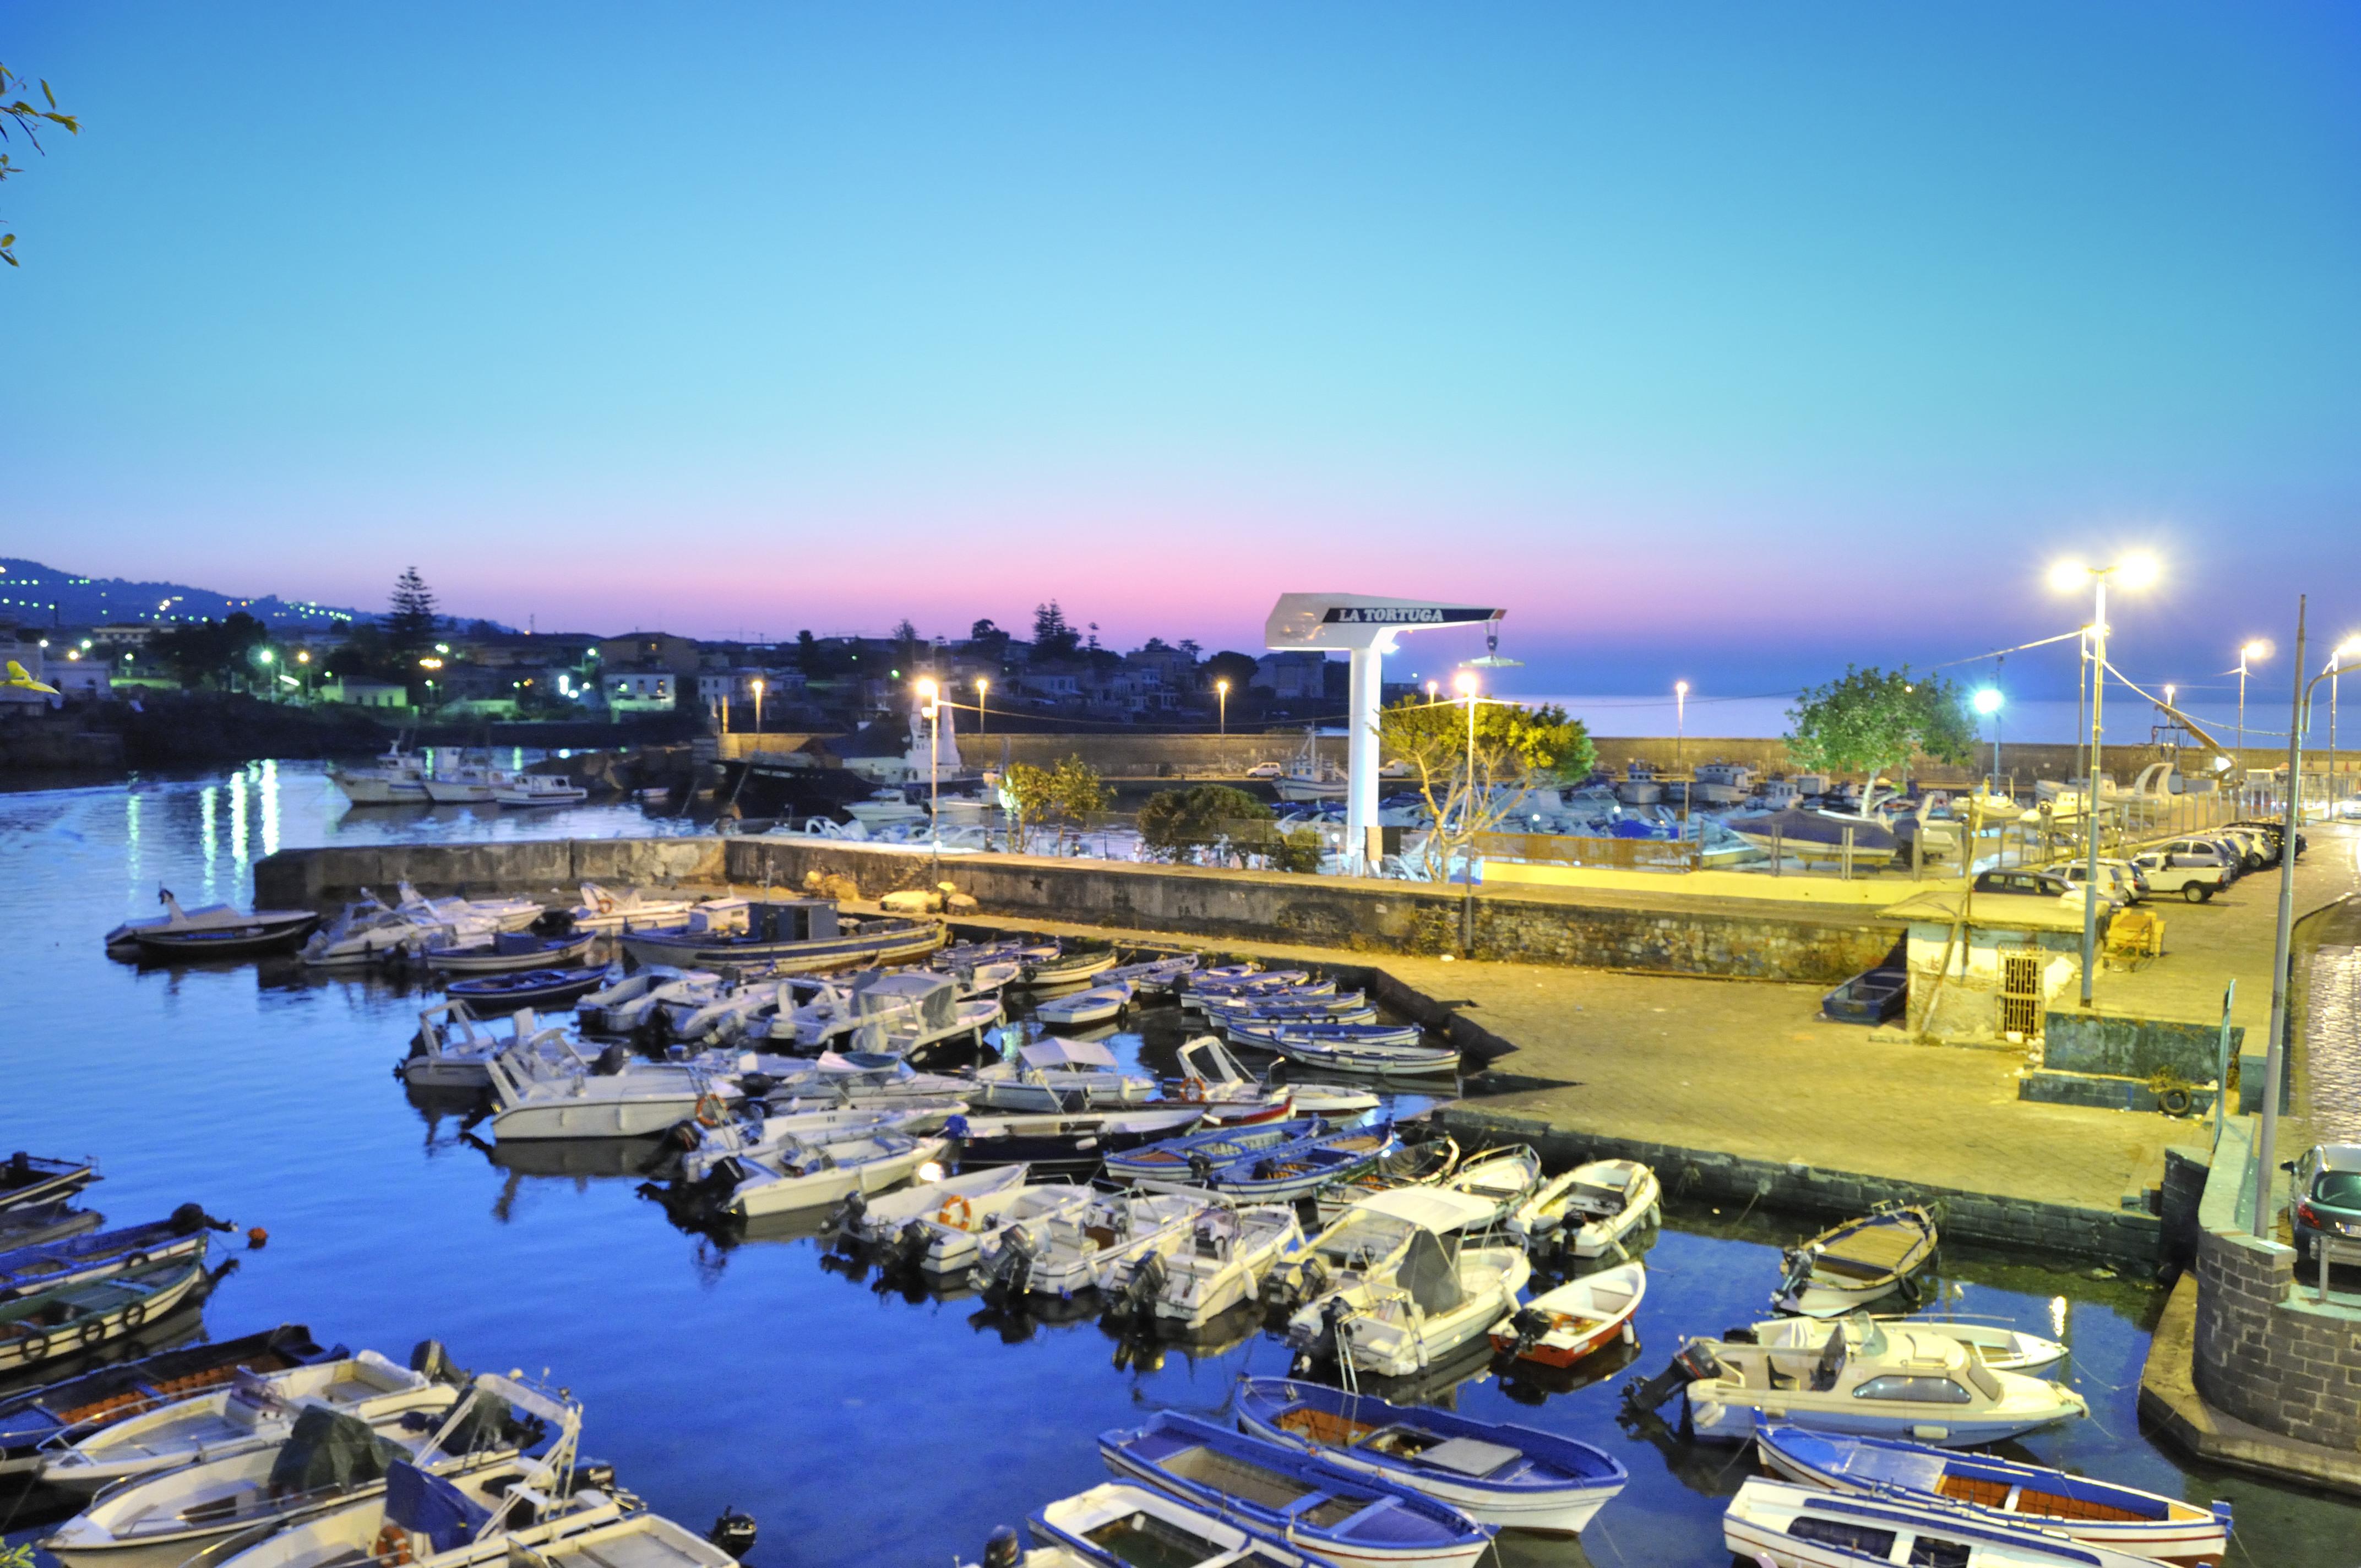 Yatching porto ulisse ognina catania sicilia italy - creative commons by gnuckx photo